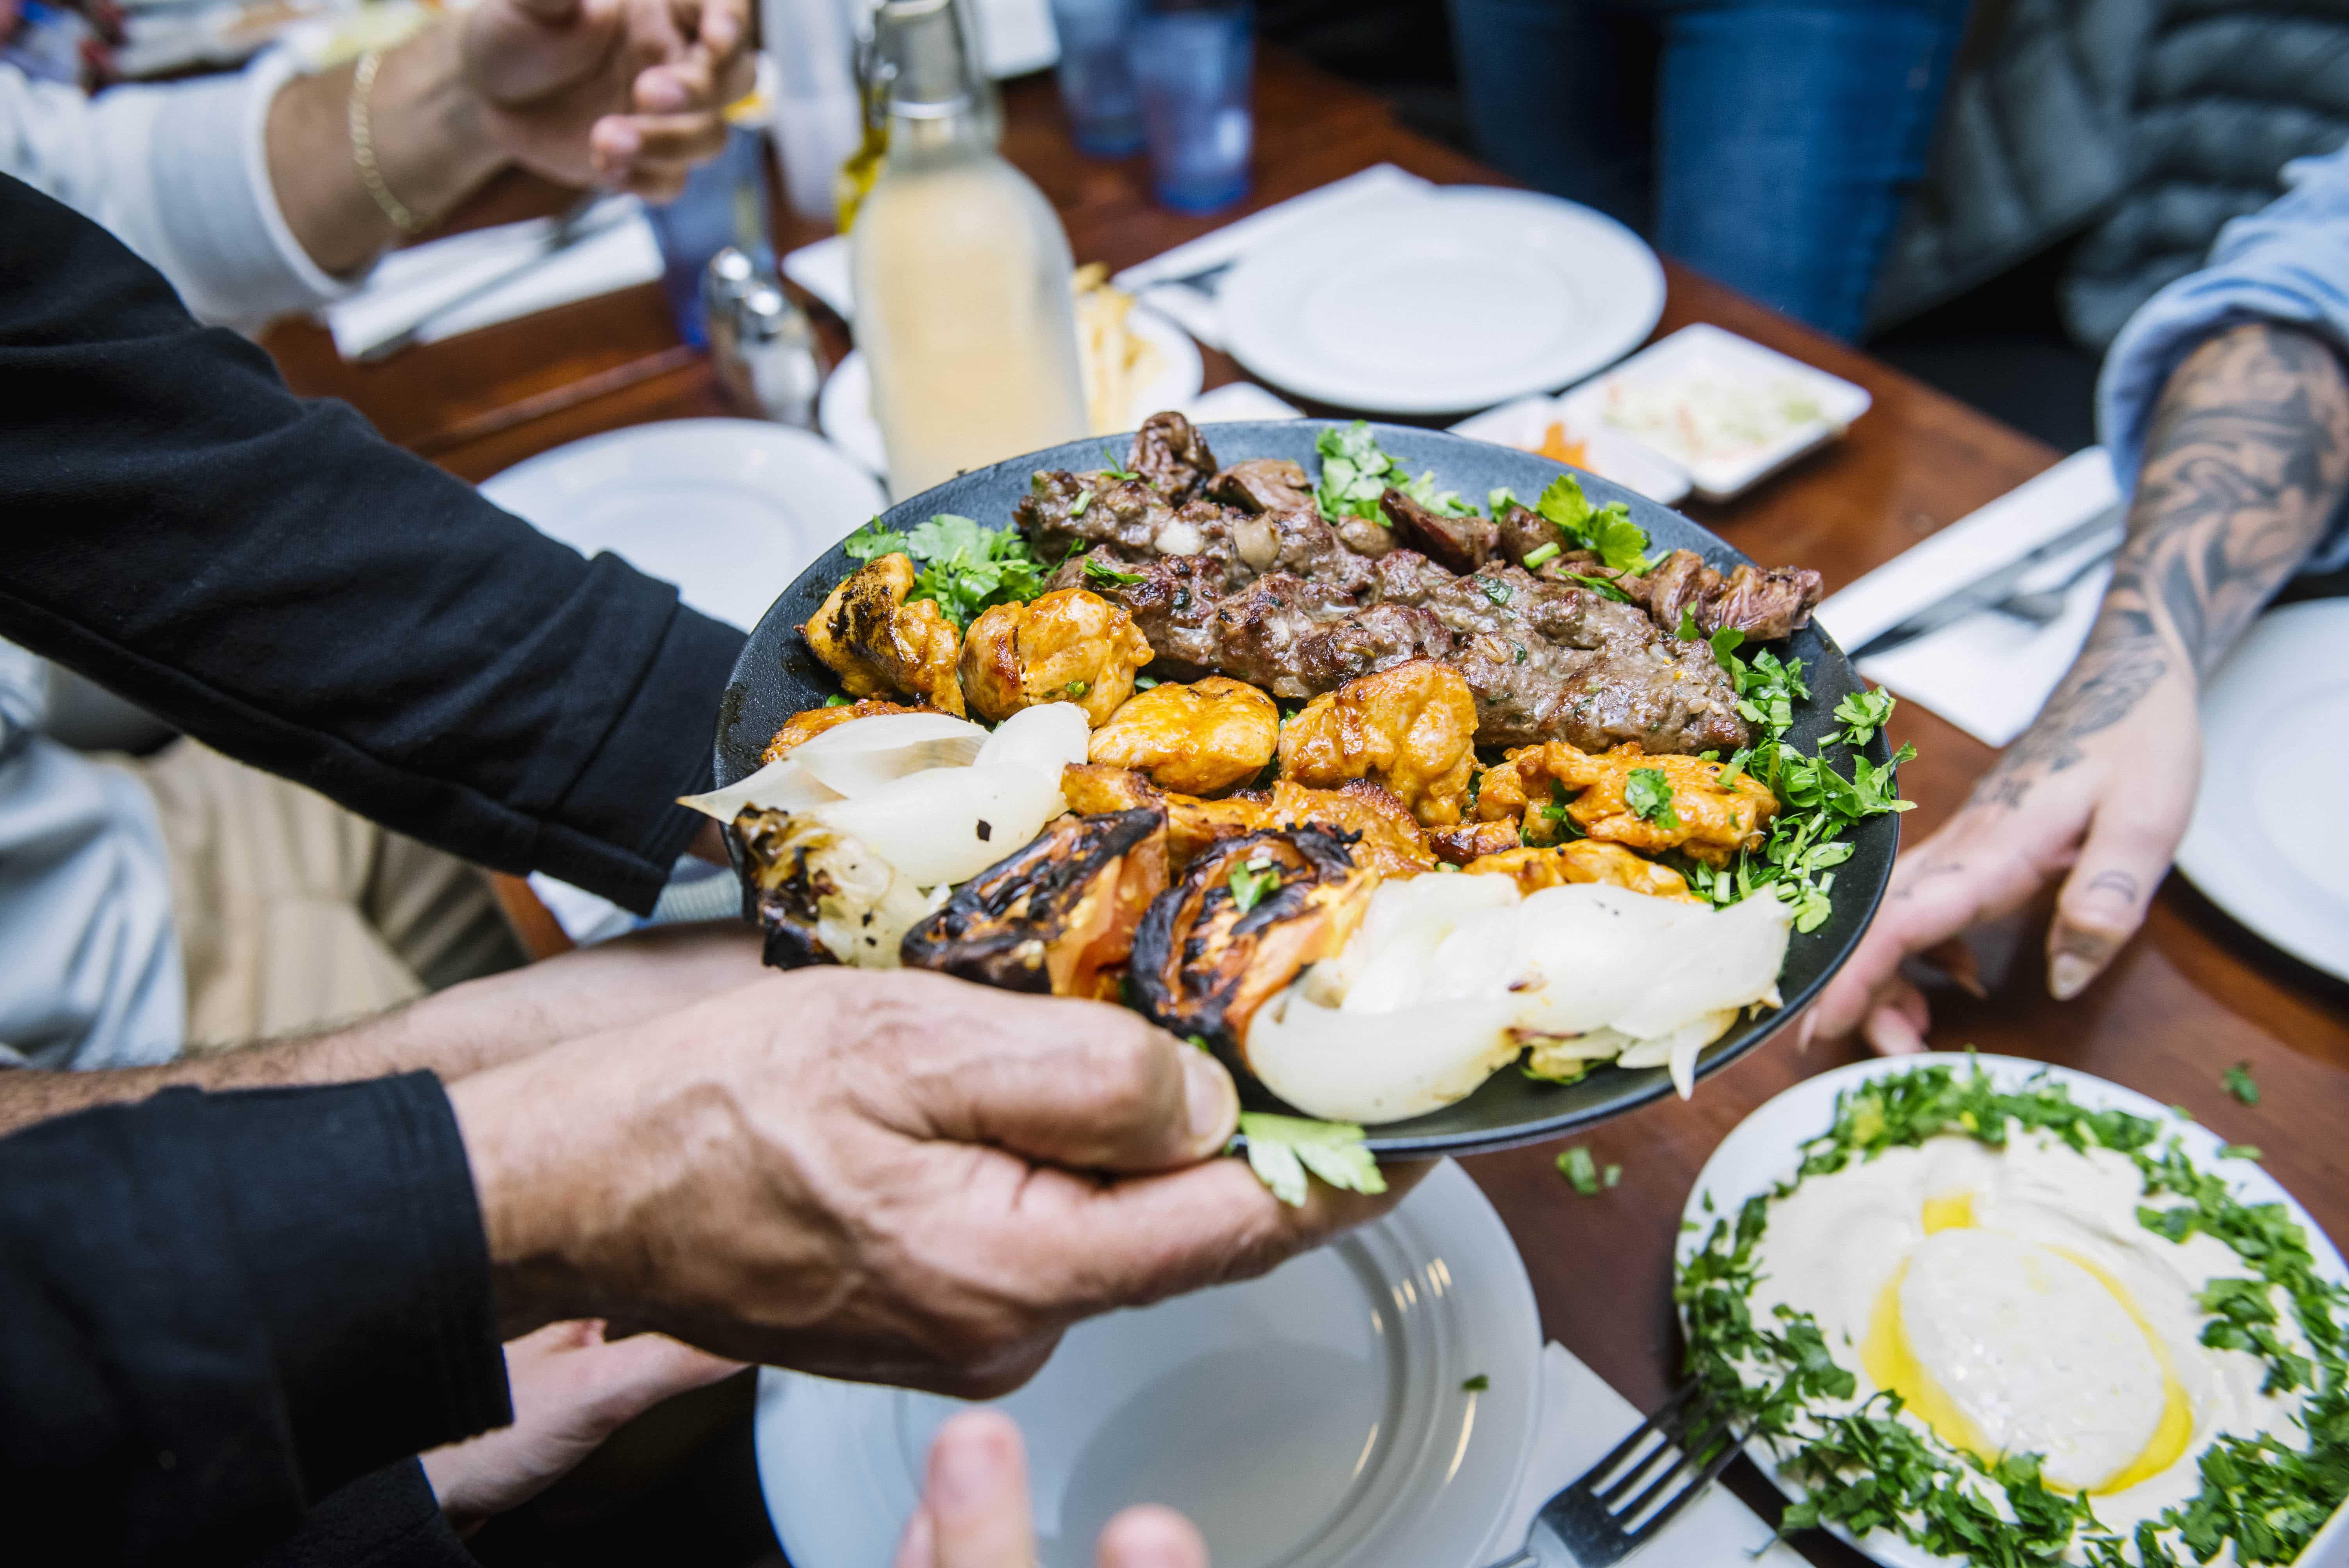 shani_sadicario comida 30N-169